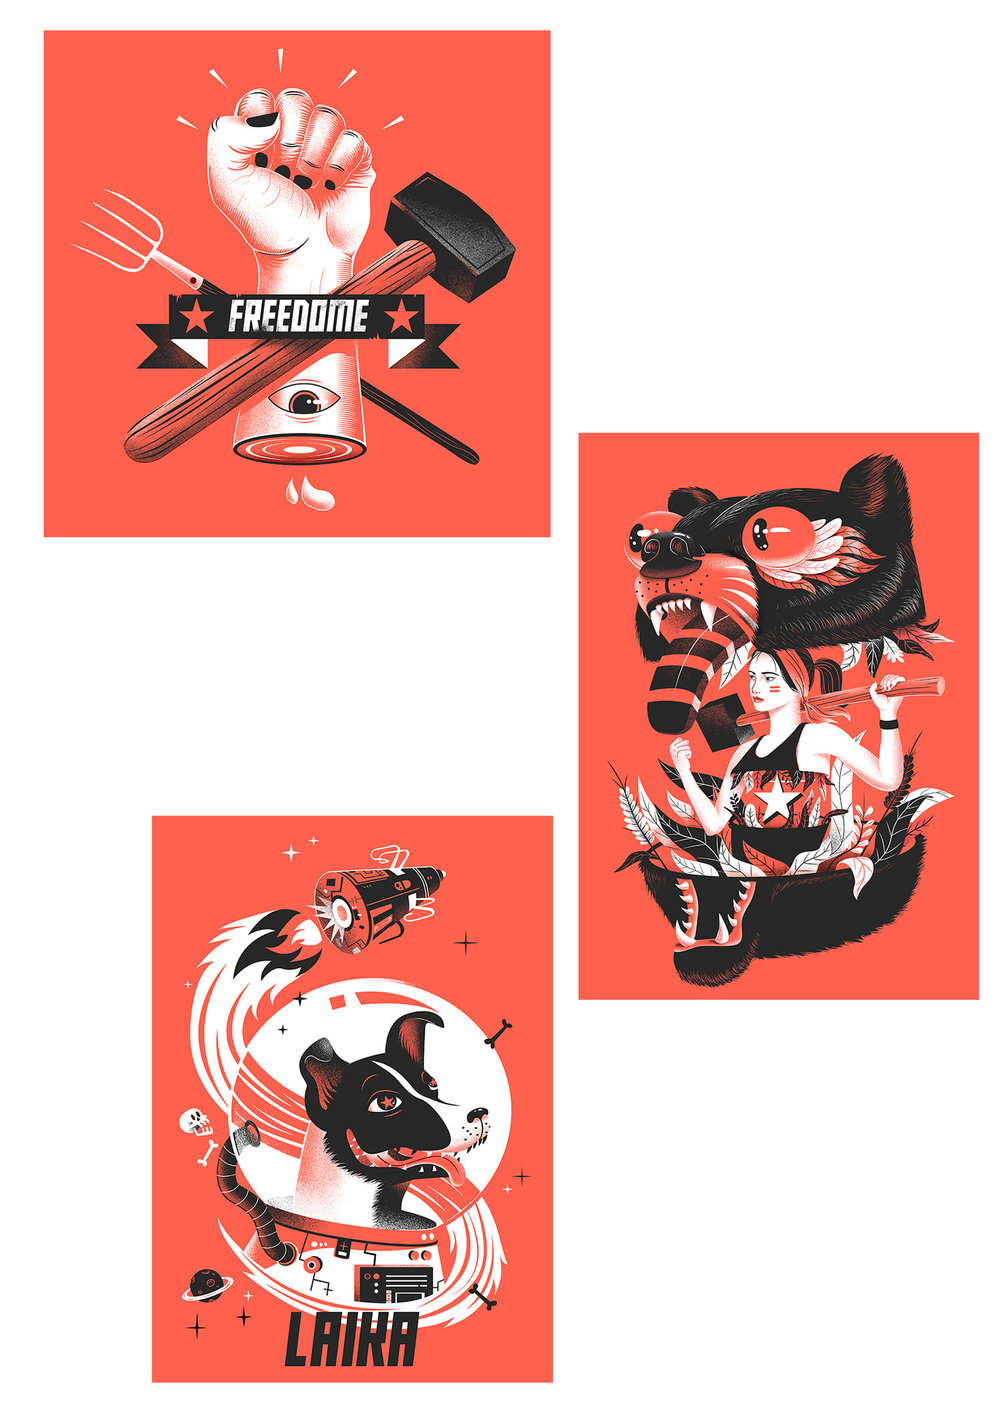 Pierre Kleinhouse illustrations for the Museum of Communism, Prague